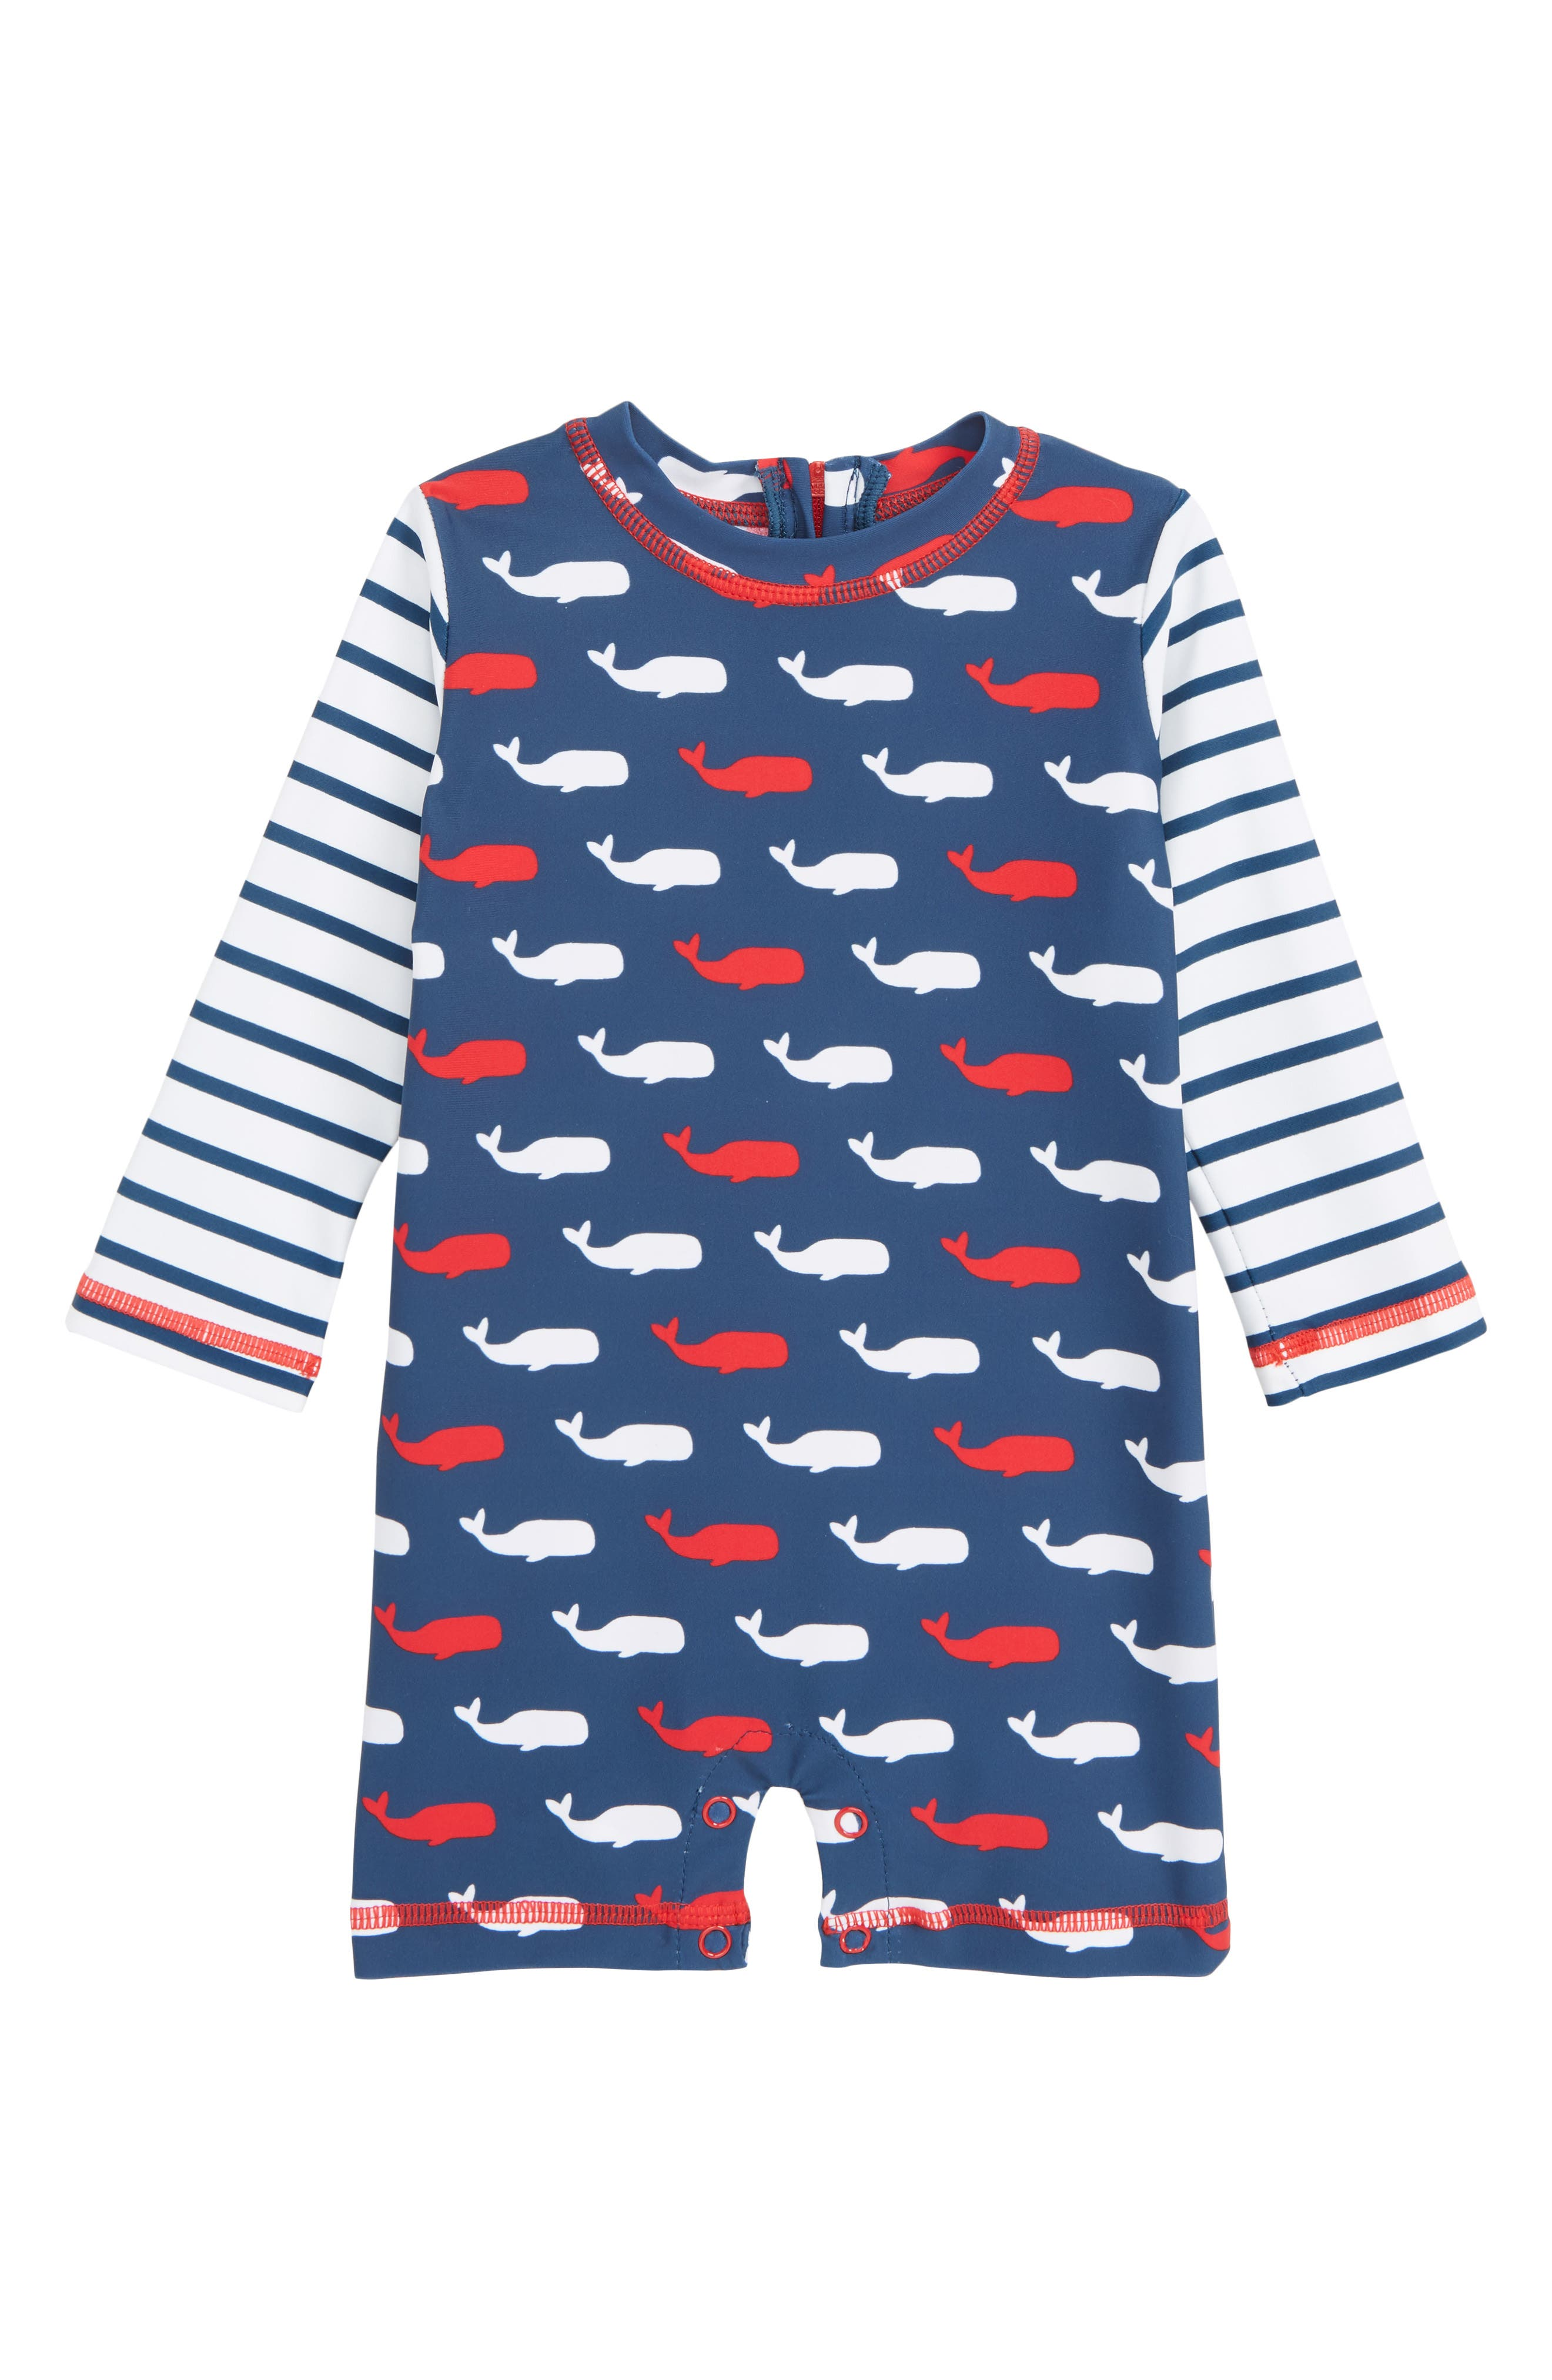 HATLEY, Whale Pod One-Piece Rashguard Swimsuit, Main thumbnail 1, color, 400